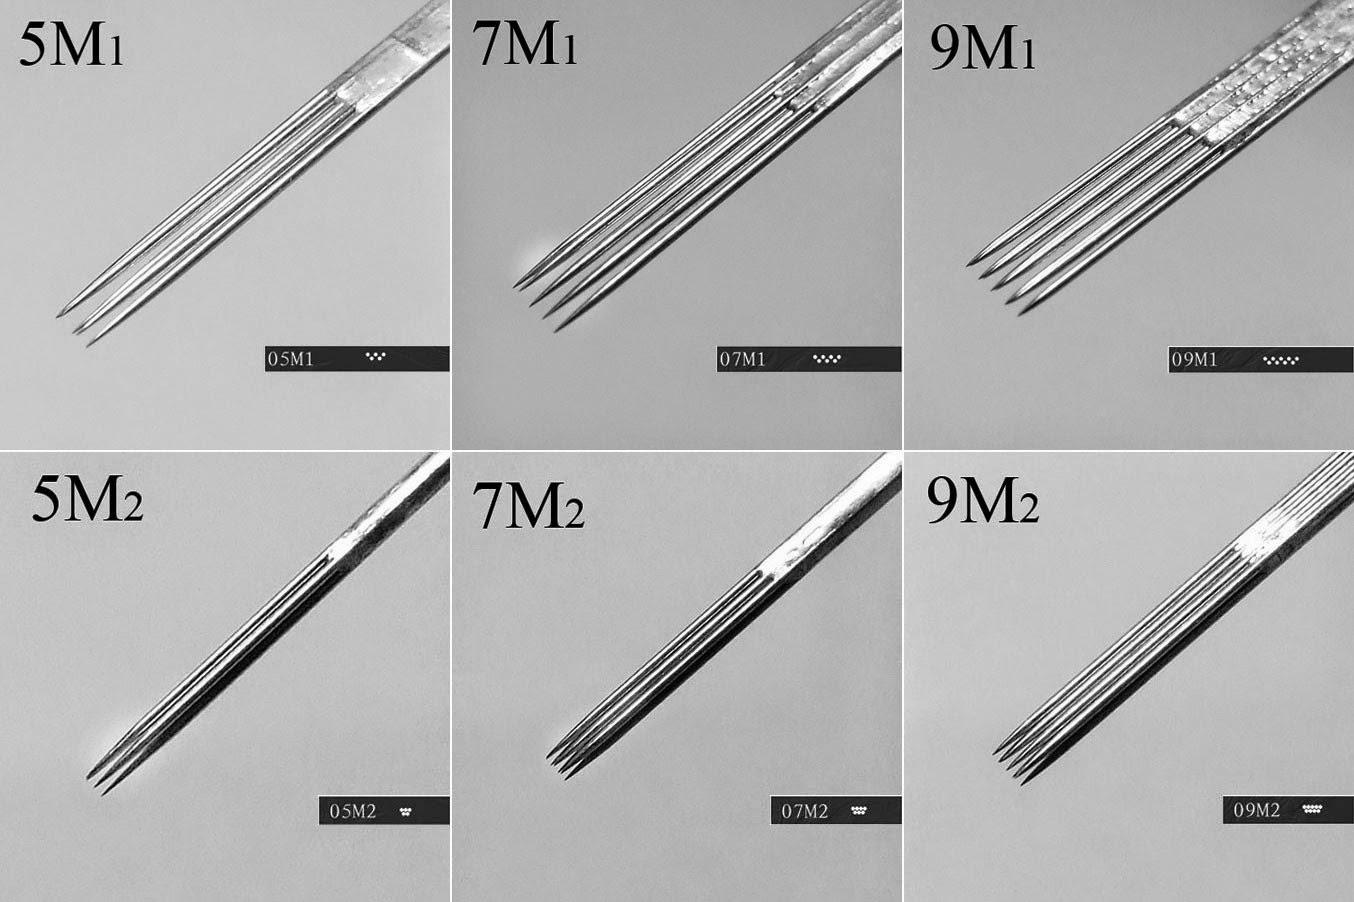 tattoo needles